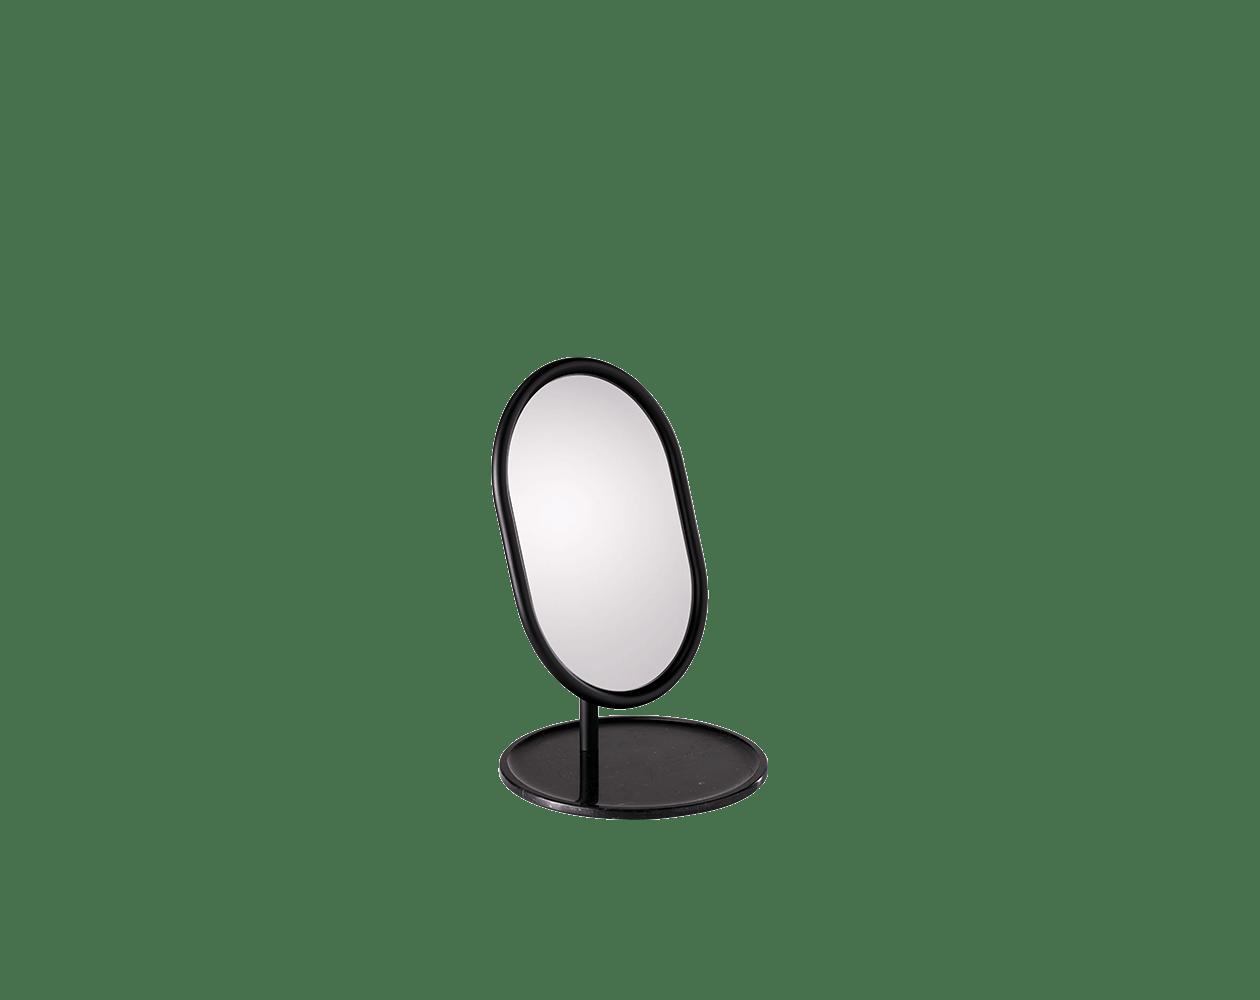 Michelle Table Mirror